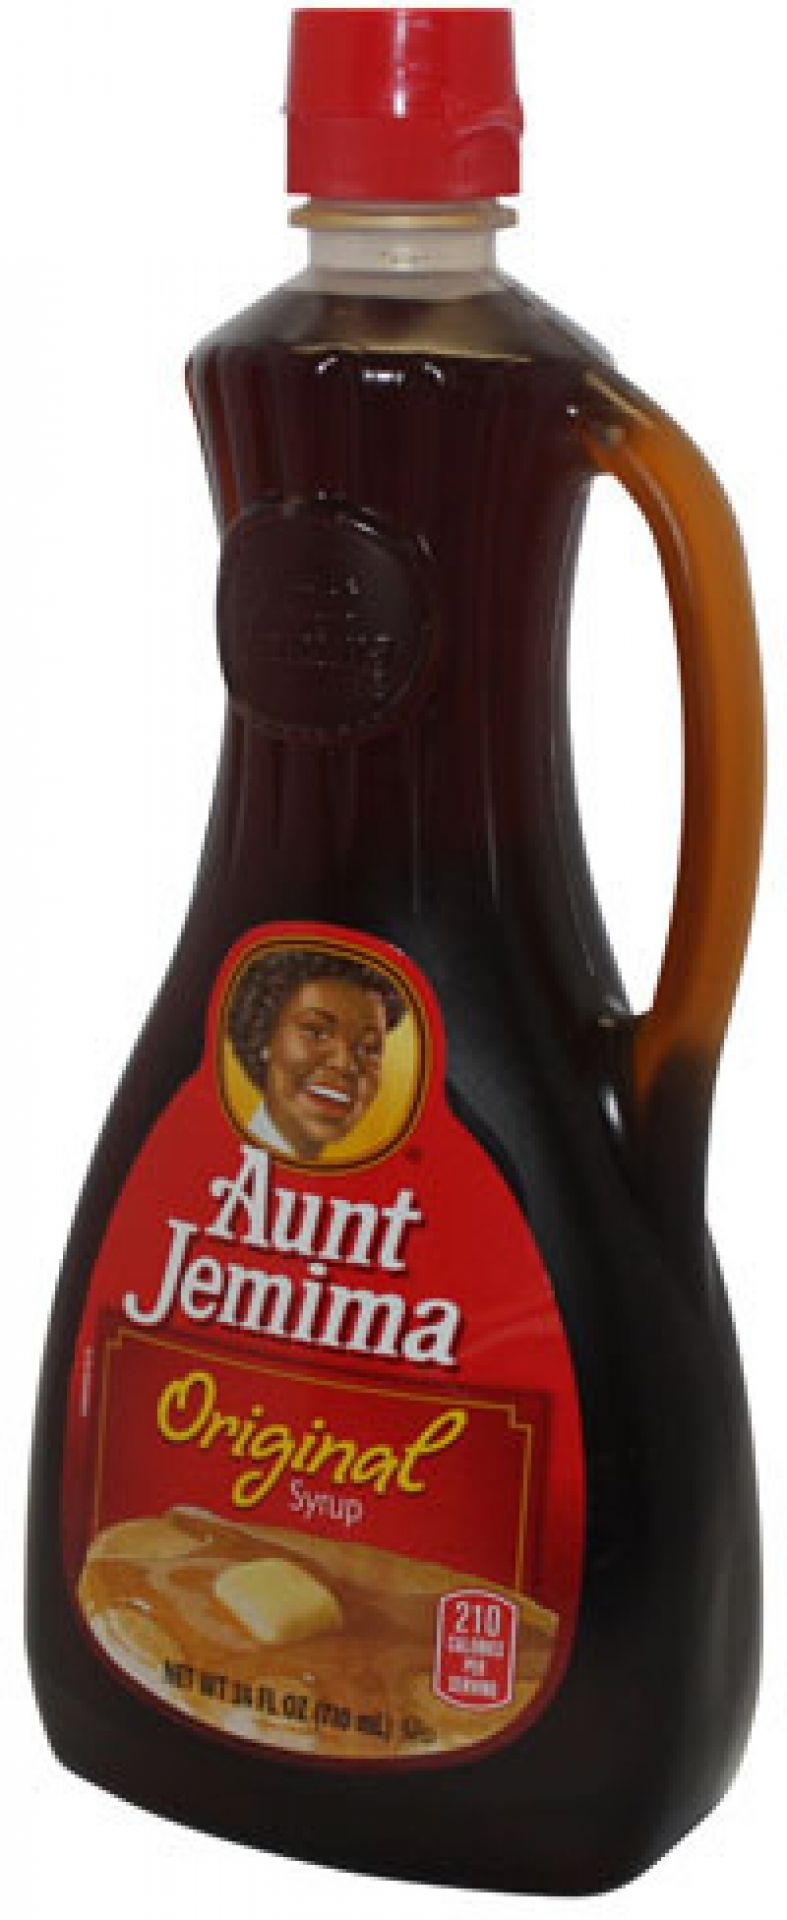 Aunt Jemima Original Syrup - 710ml